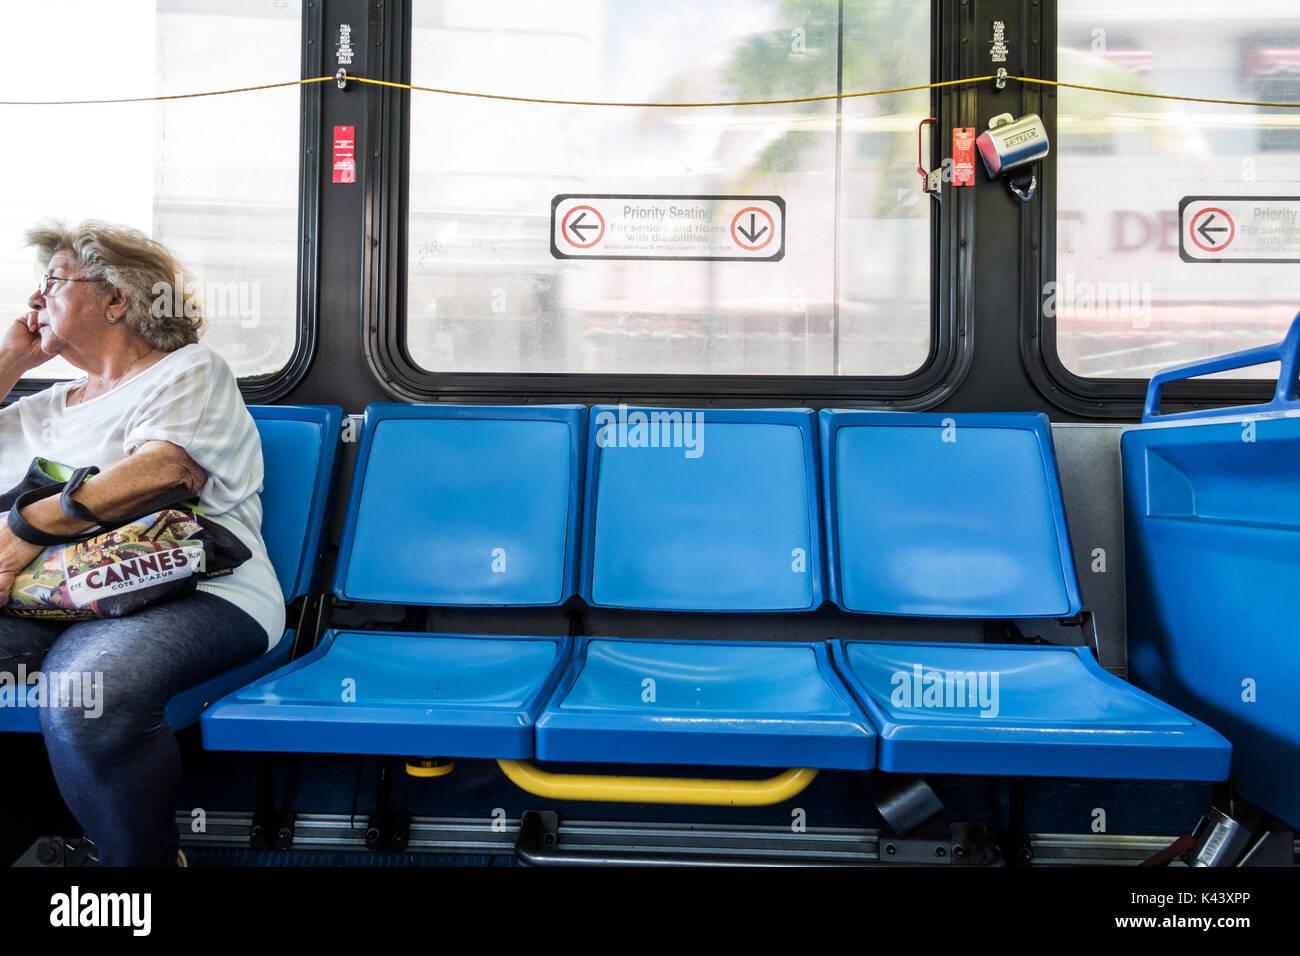 Miami Beach Miami Florida-Dade Metrobus public transportation bus interior seats senior rider passenger - Stock Image